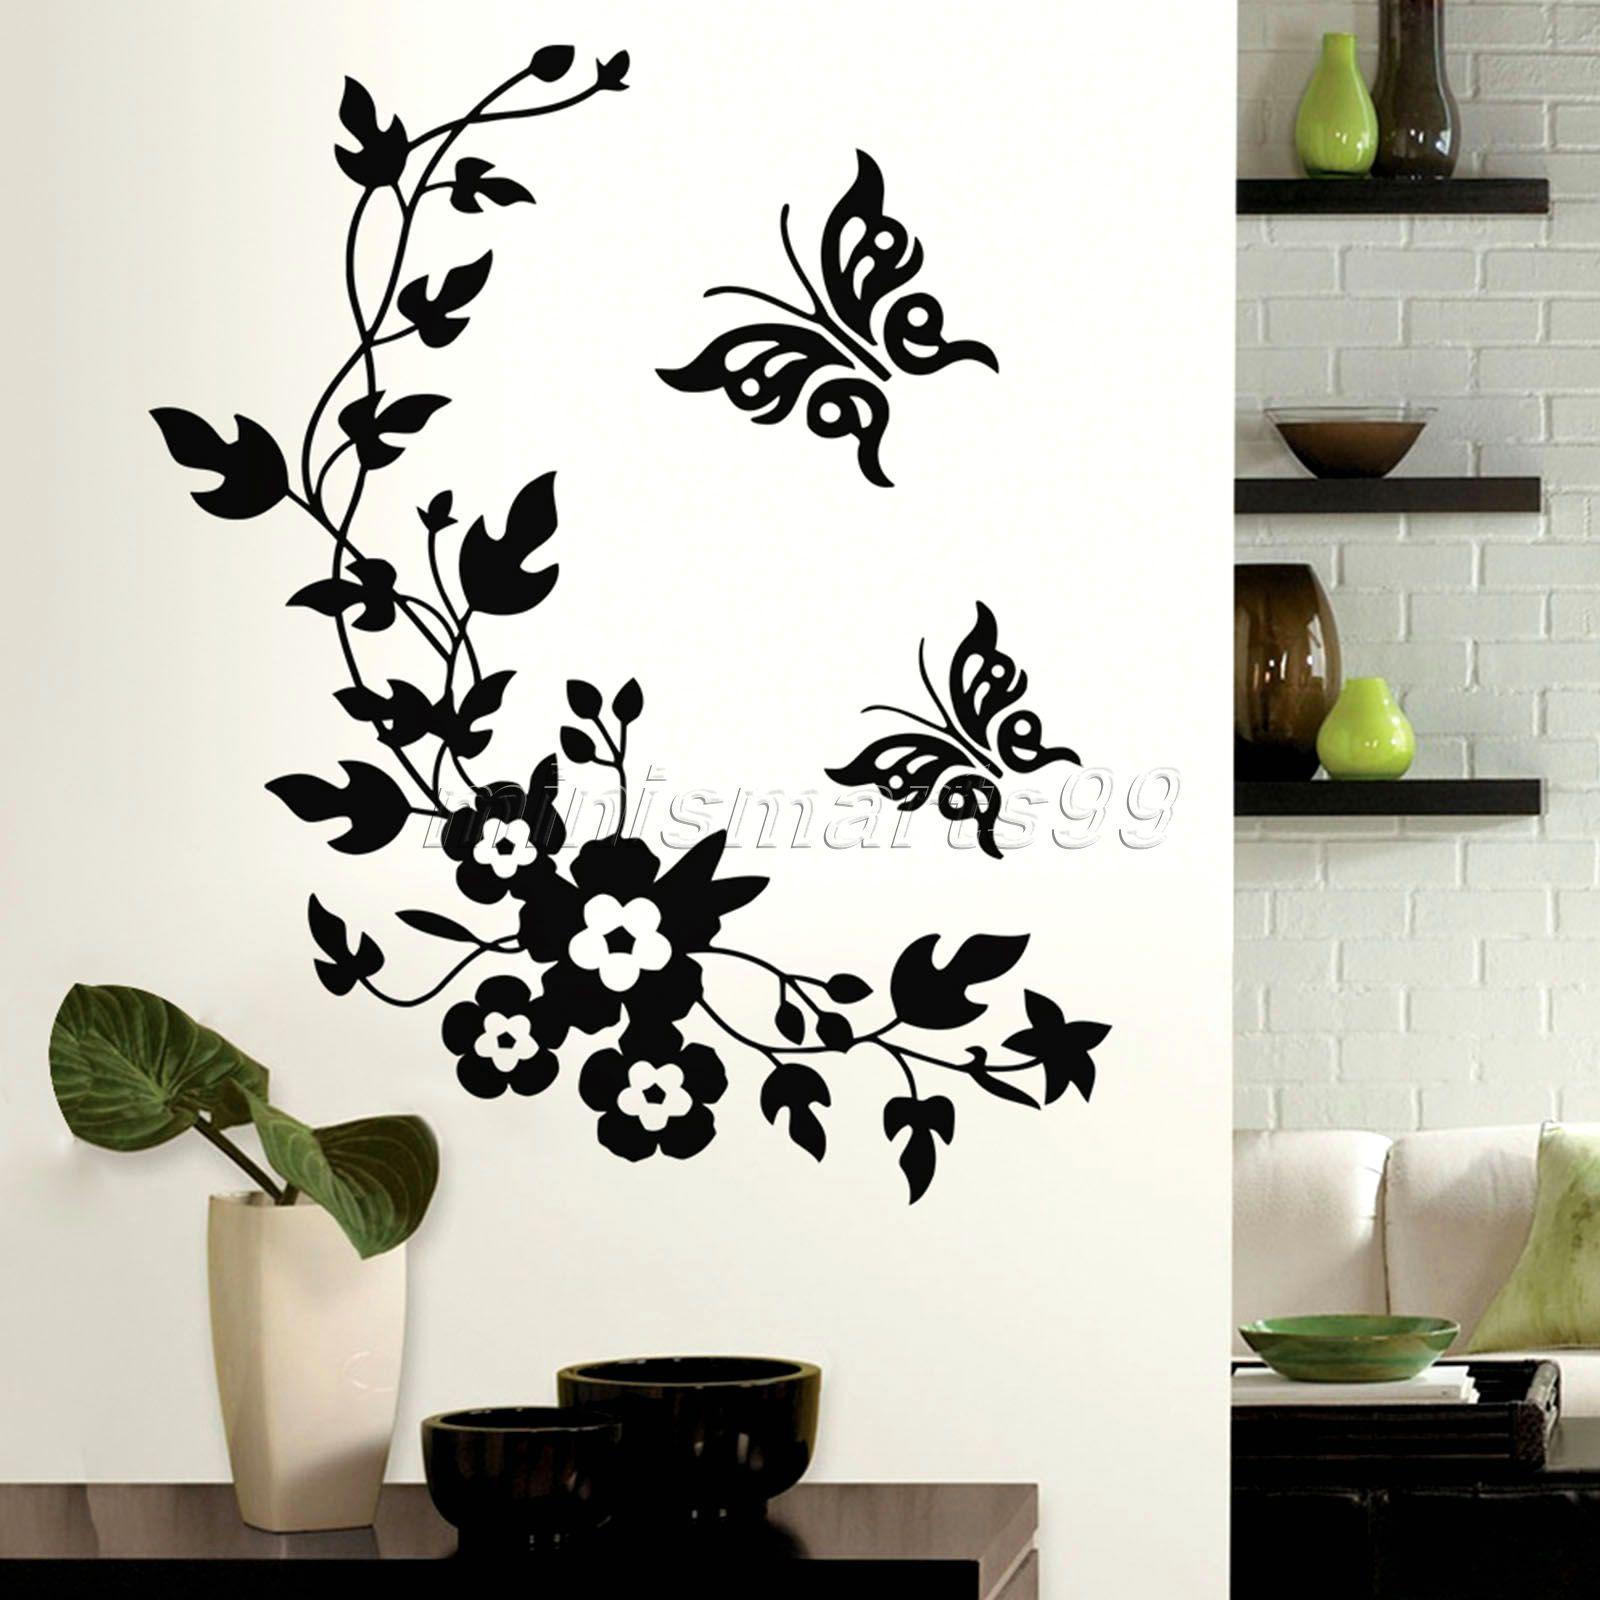 online get cheap butterfly nursery decor aliexpress com alibaba butterflies flowers animals stack wall stickers decal kids adhesive vinyl wallpaper mural baby girl boy room